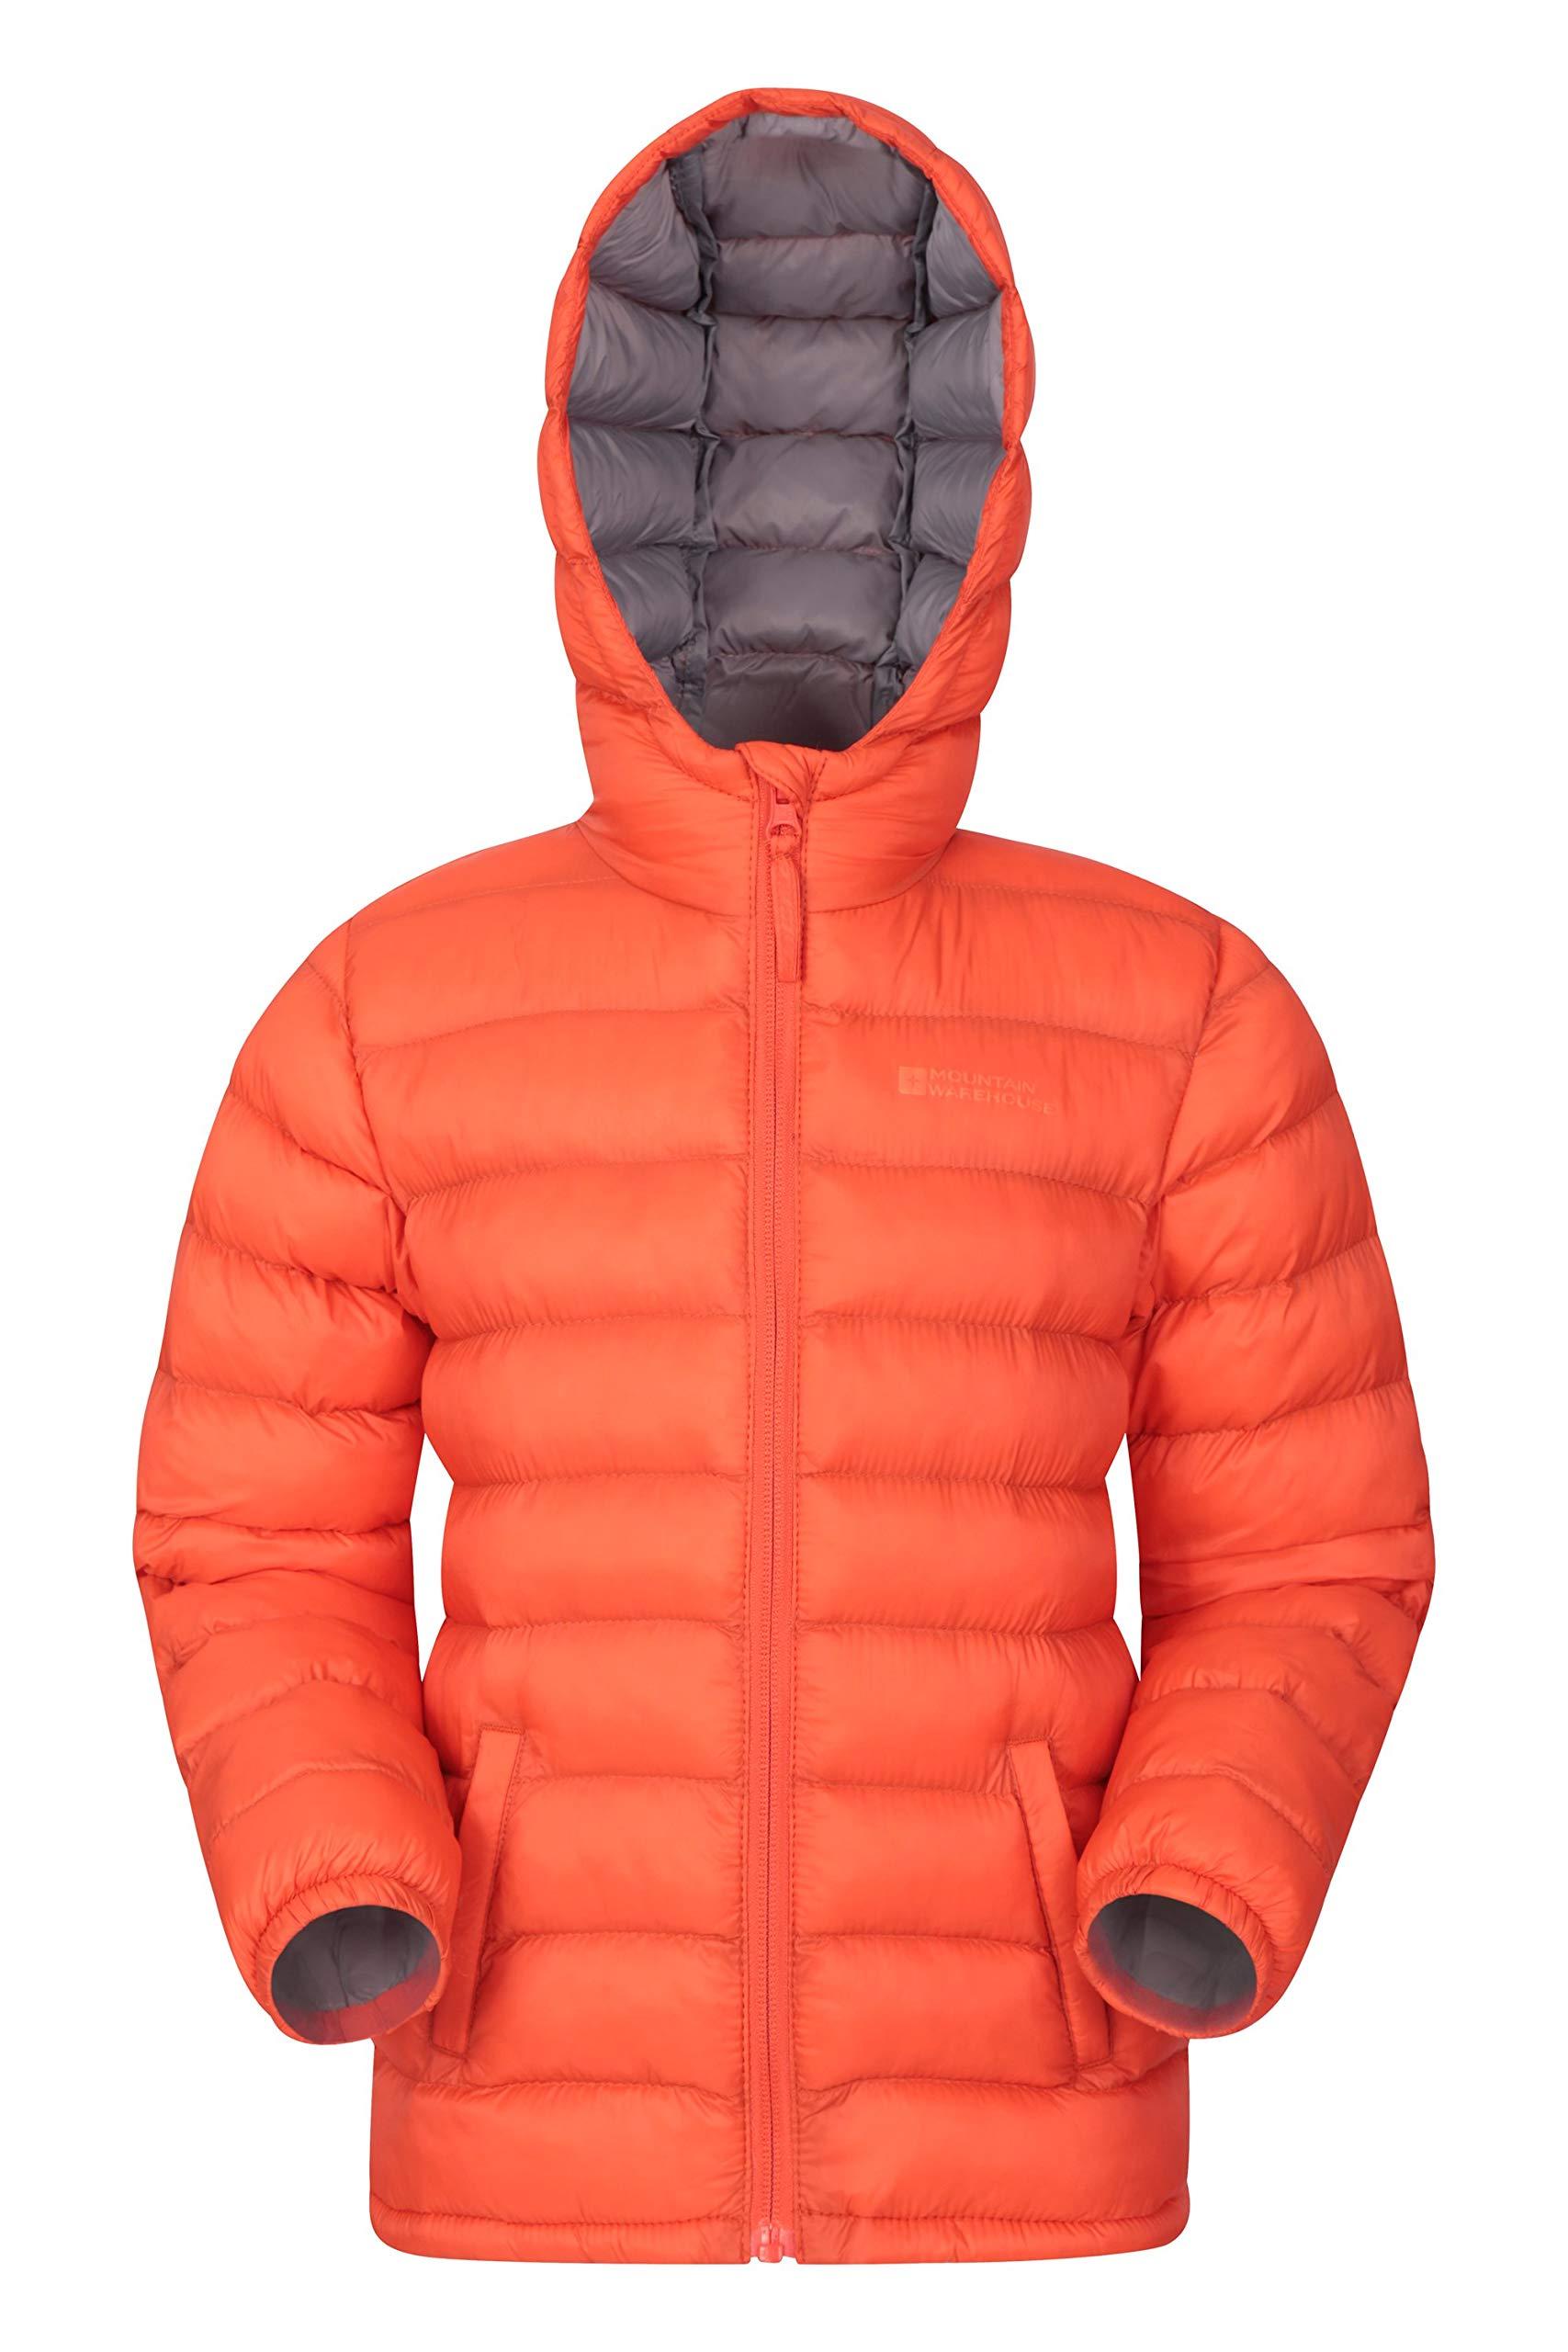 Mountain Warehouse Seasons Boys Jacket - Kids Autumn Rain Coat Orange 7-8 Years by Mountain Warehouse